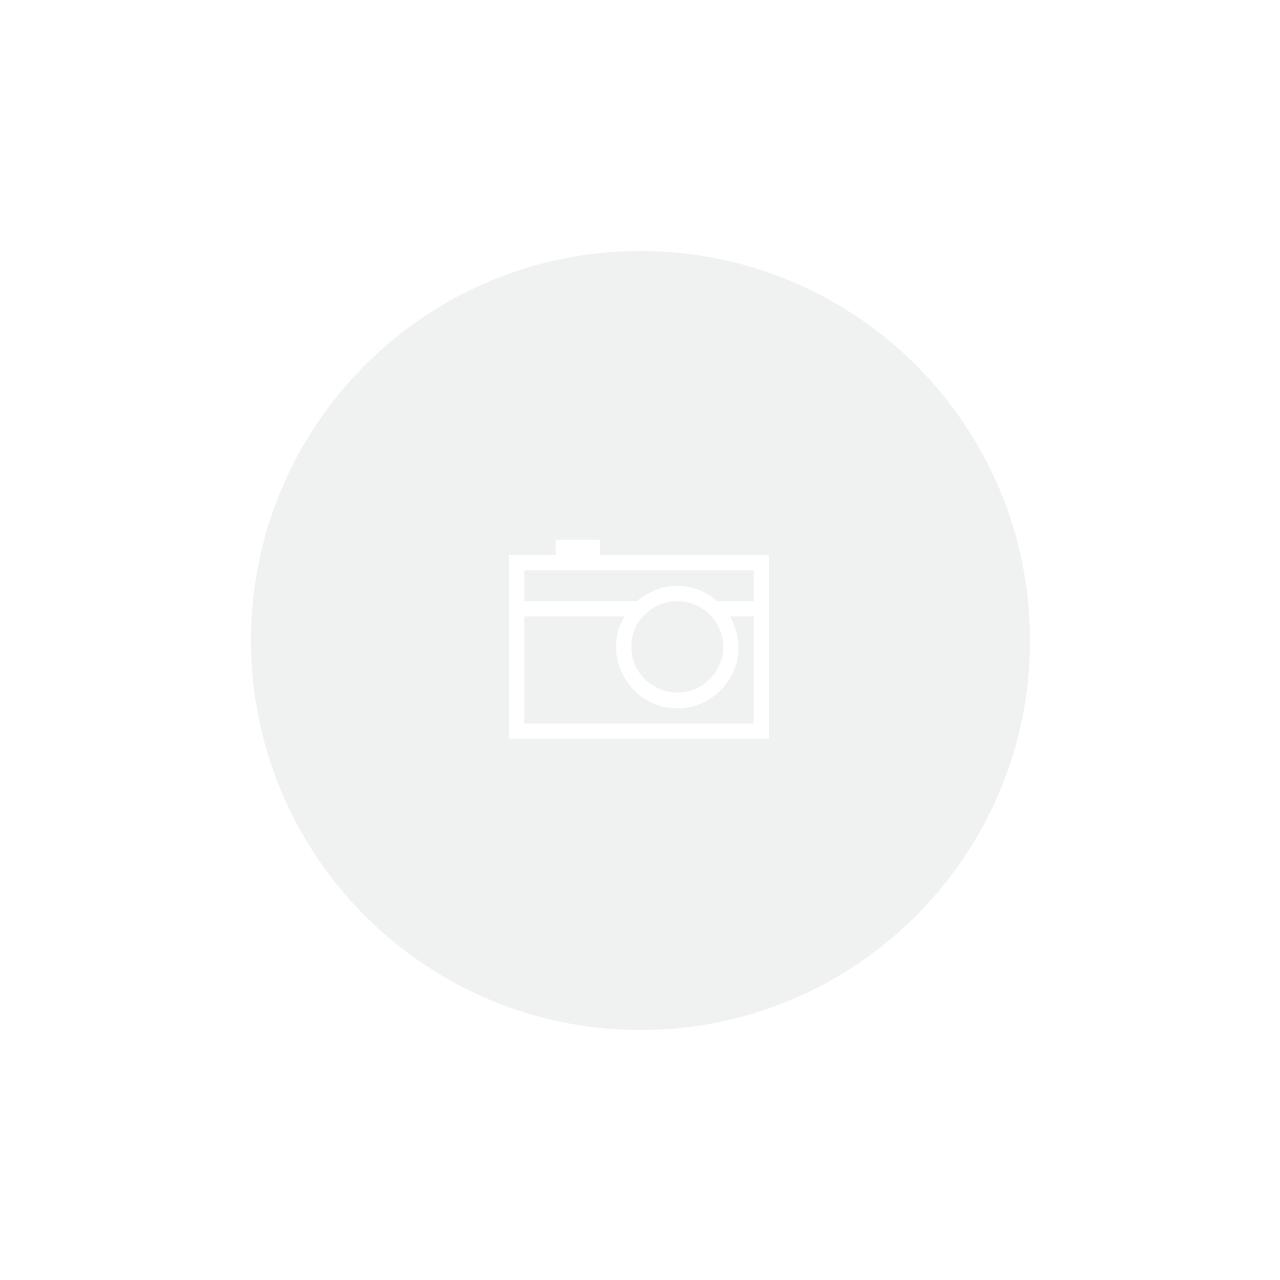 BICICLETA 29 BMC TEAMELITE 02 ONE 2019 CARBON 12V EAGLE